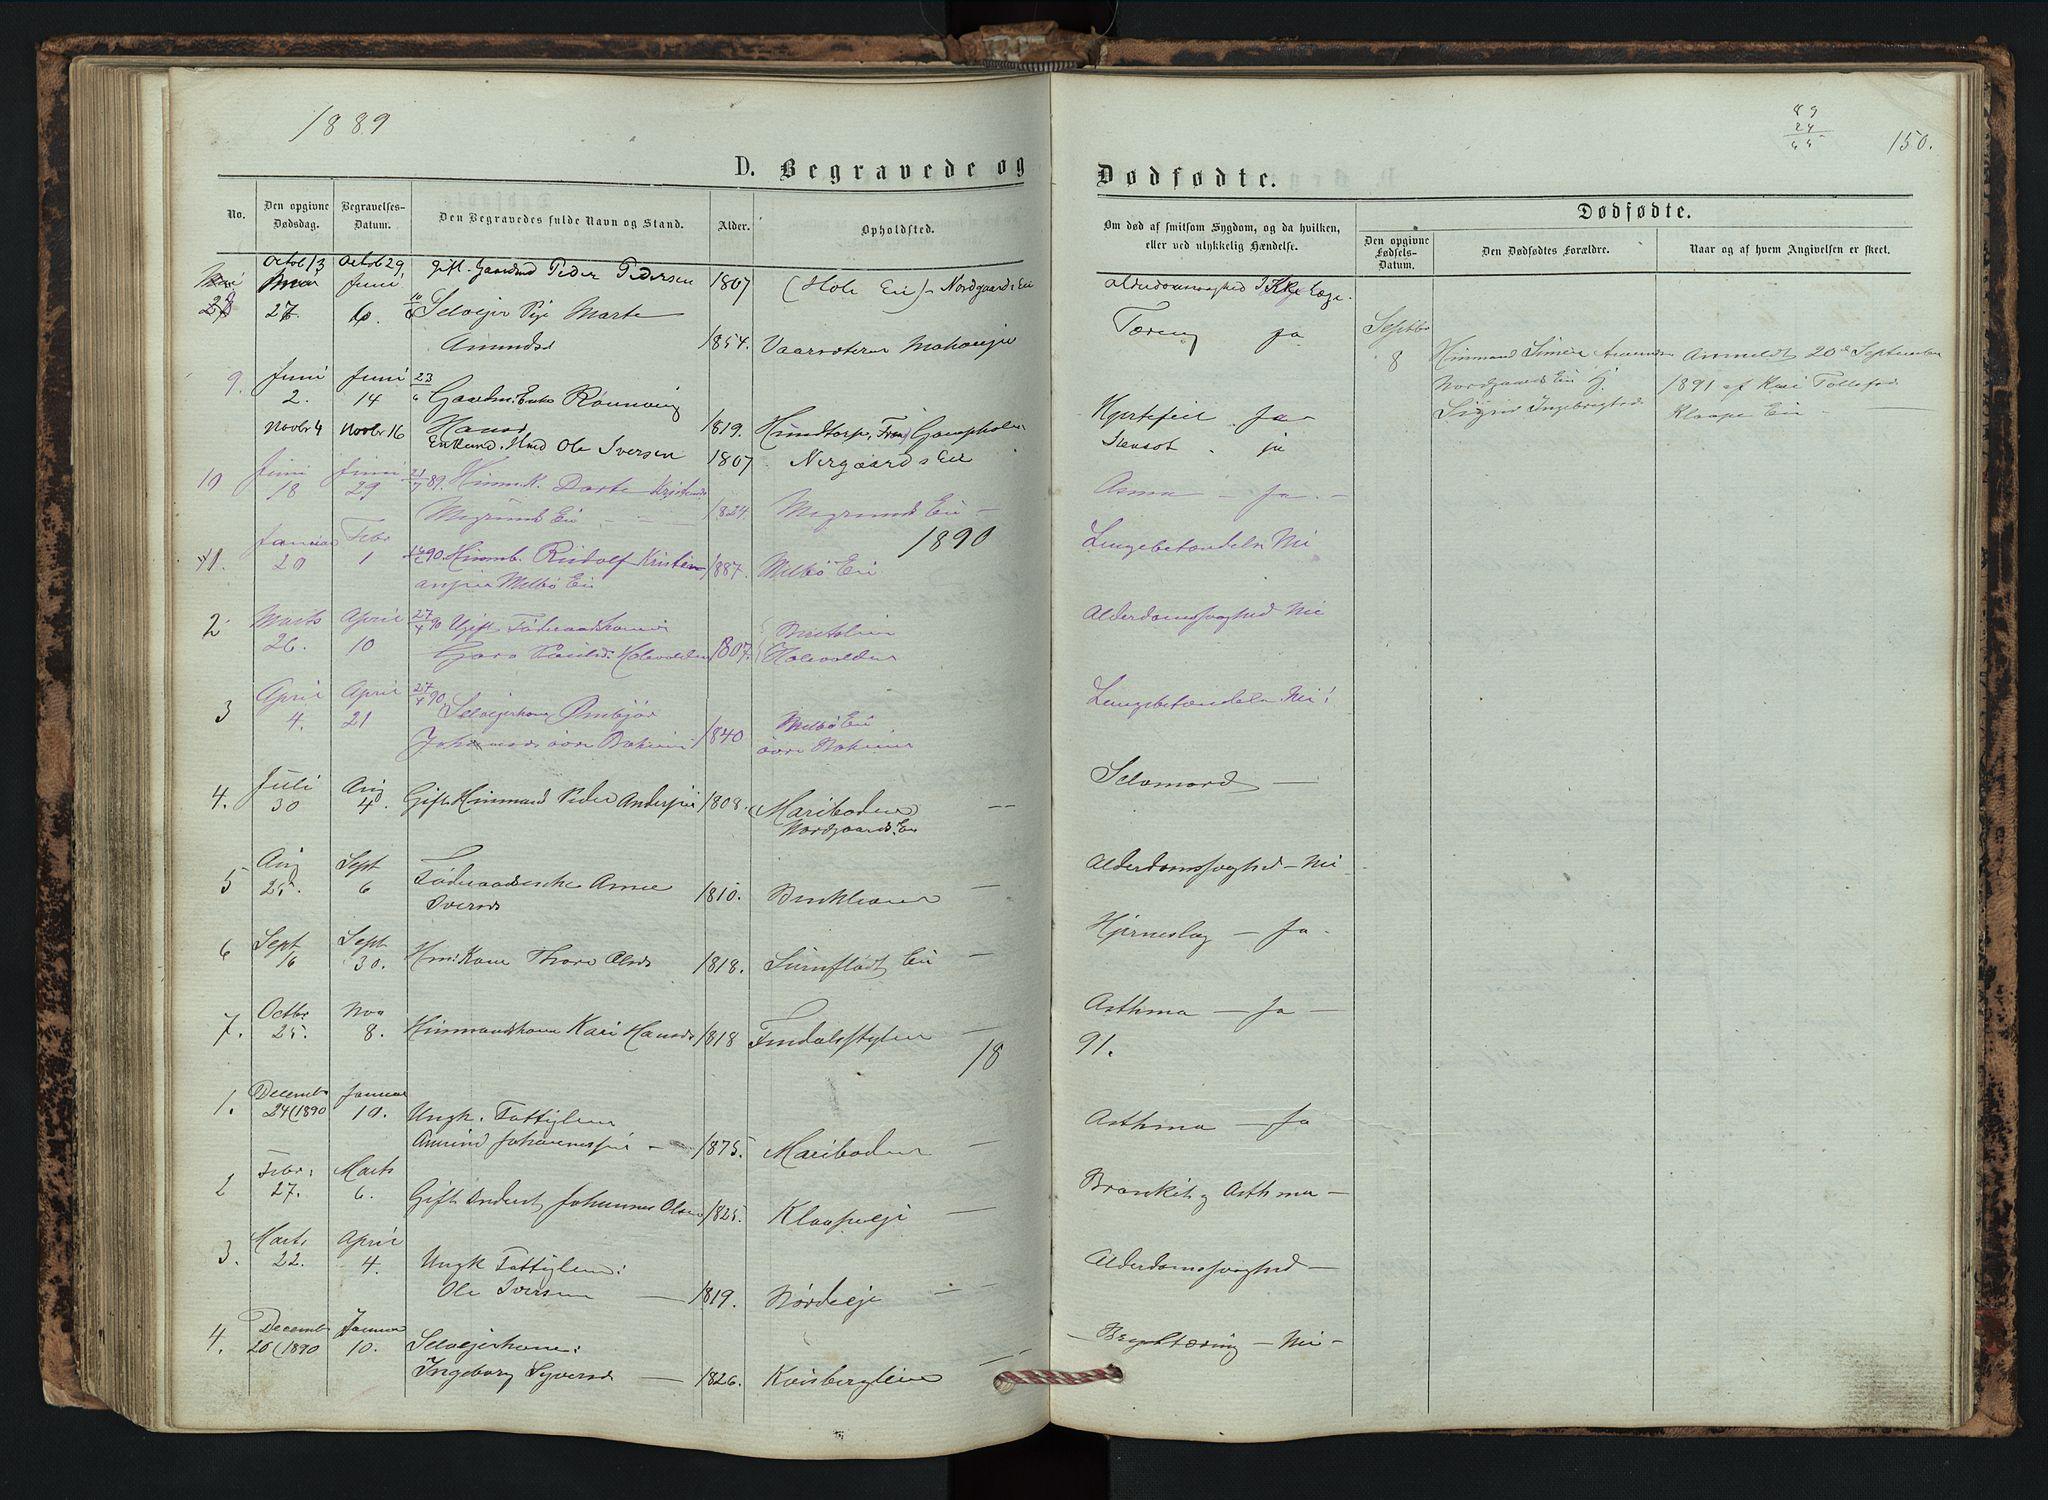 SAH, Vestre Gausdal prestekontor, Klokkerbok nr. 2, 1874-1897, s. 150